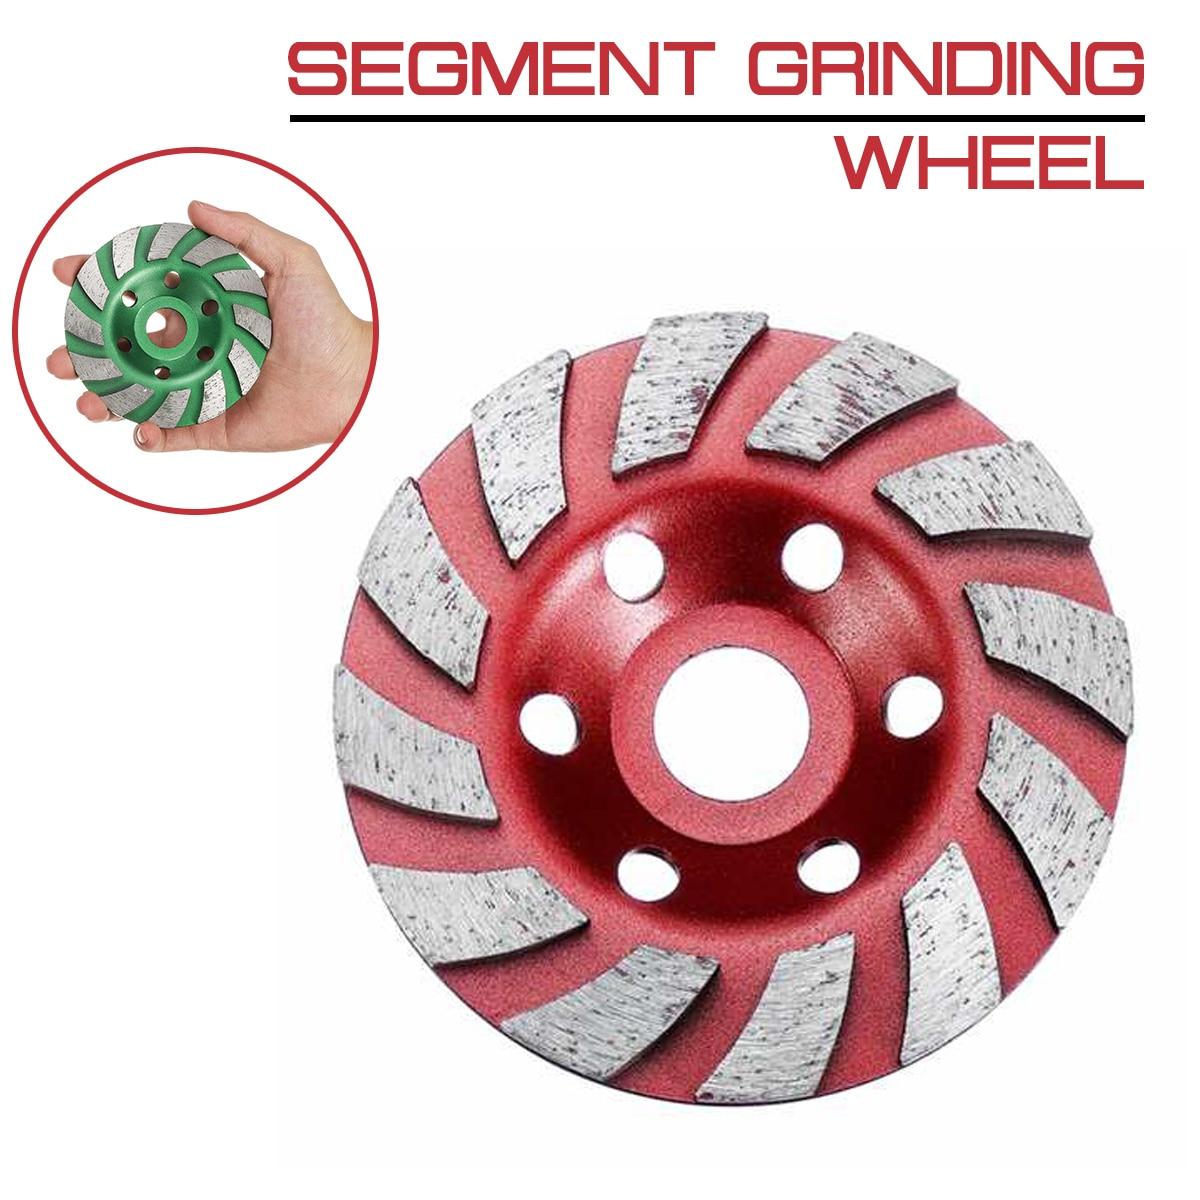 100mm/4 Inch Diamond Grinding Wheel Disc Bowl Shape Grinding Cup Stone Concrete Granite Ceramics Tools